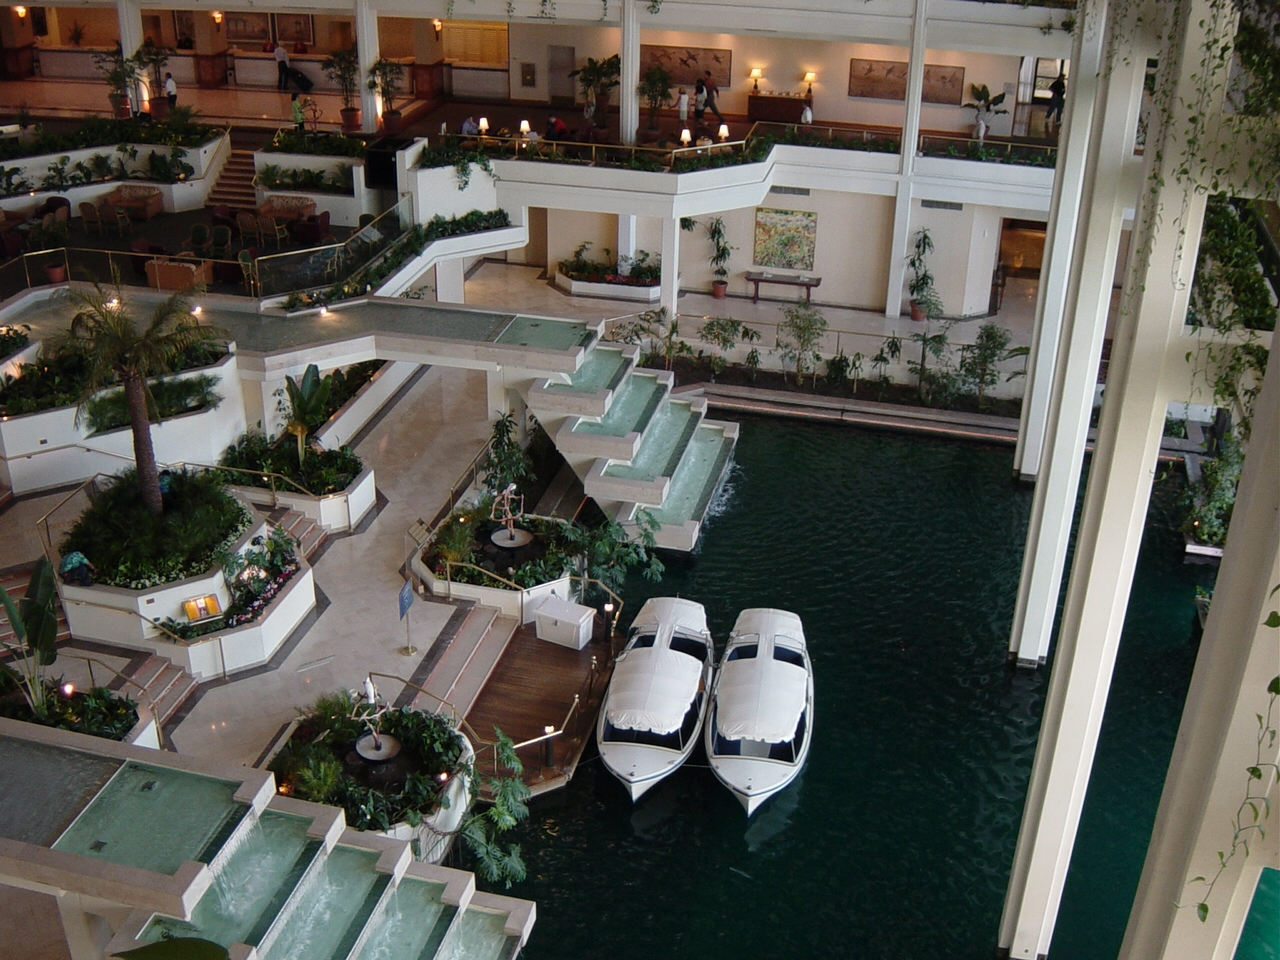 Hotel Foyer Spa : Jw marriott desert springs resort and spa palm